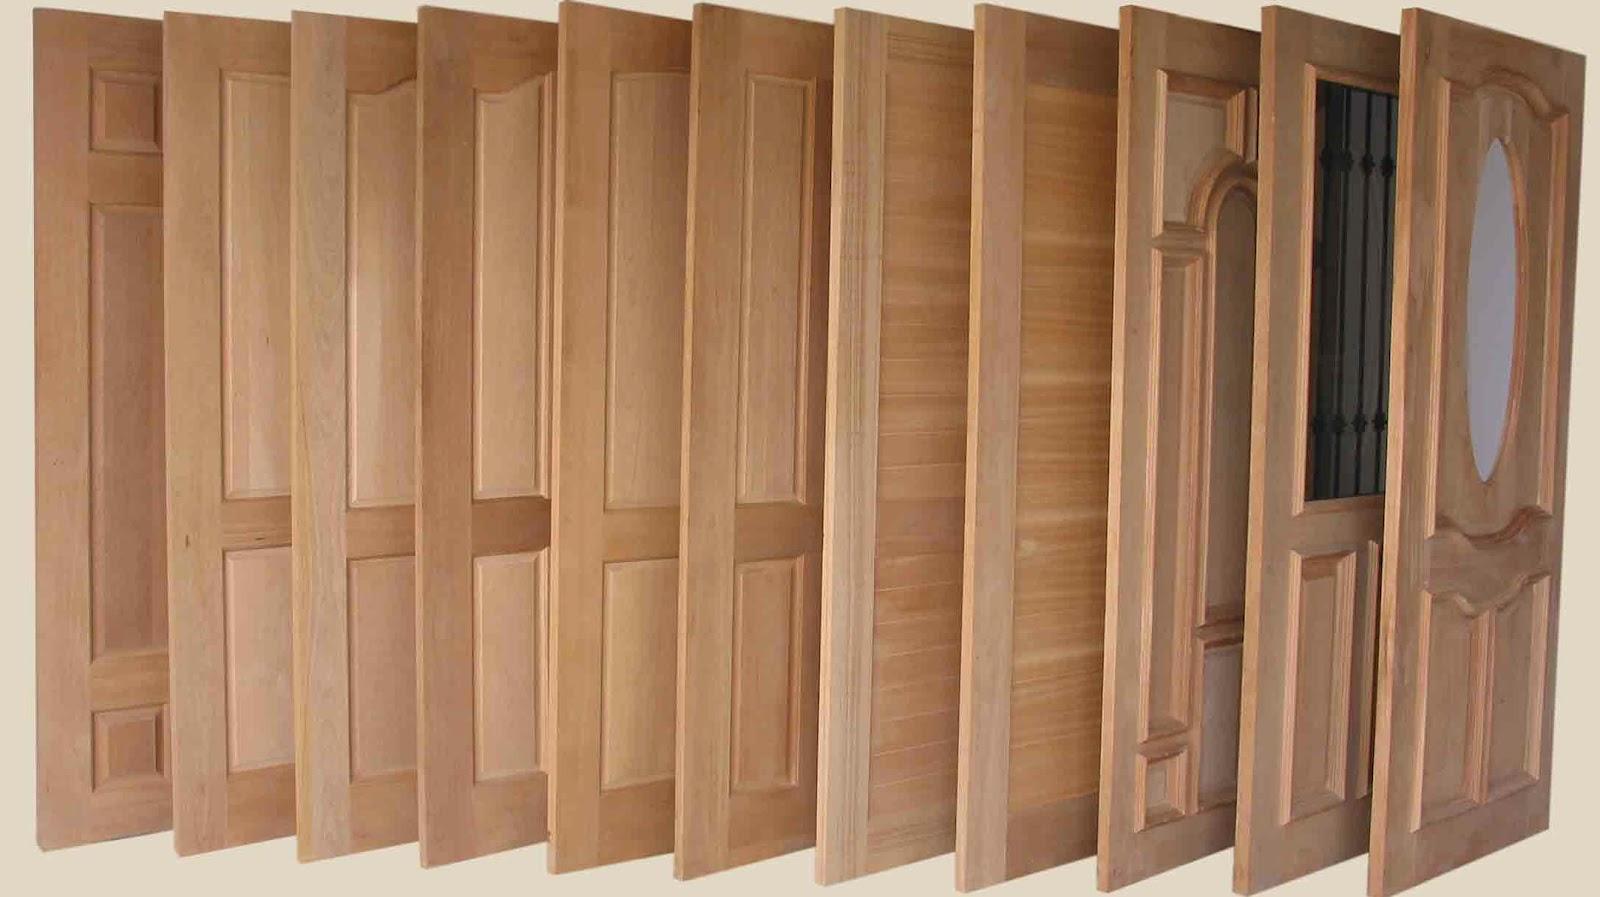 Carpinteria y ebanisteria trujillo for Fabricacion puertas madera